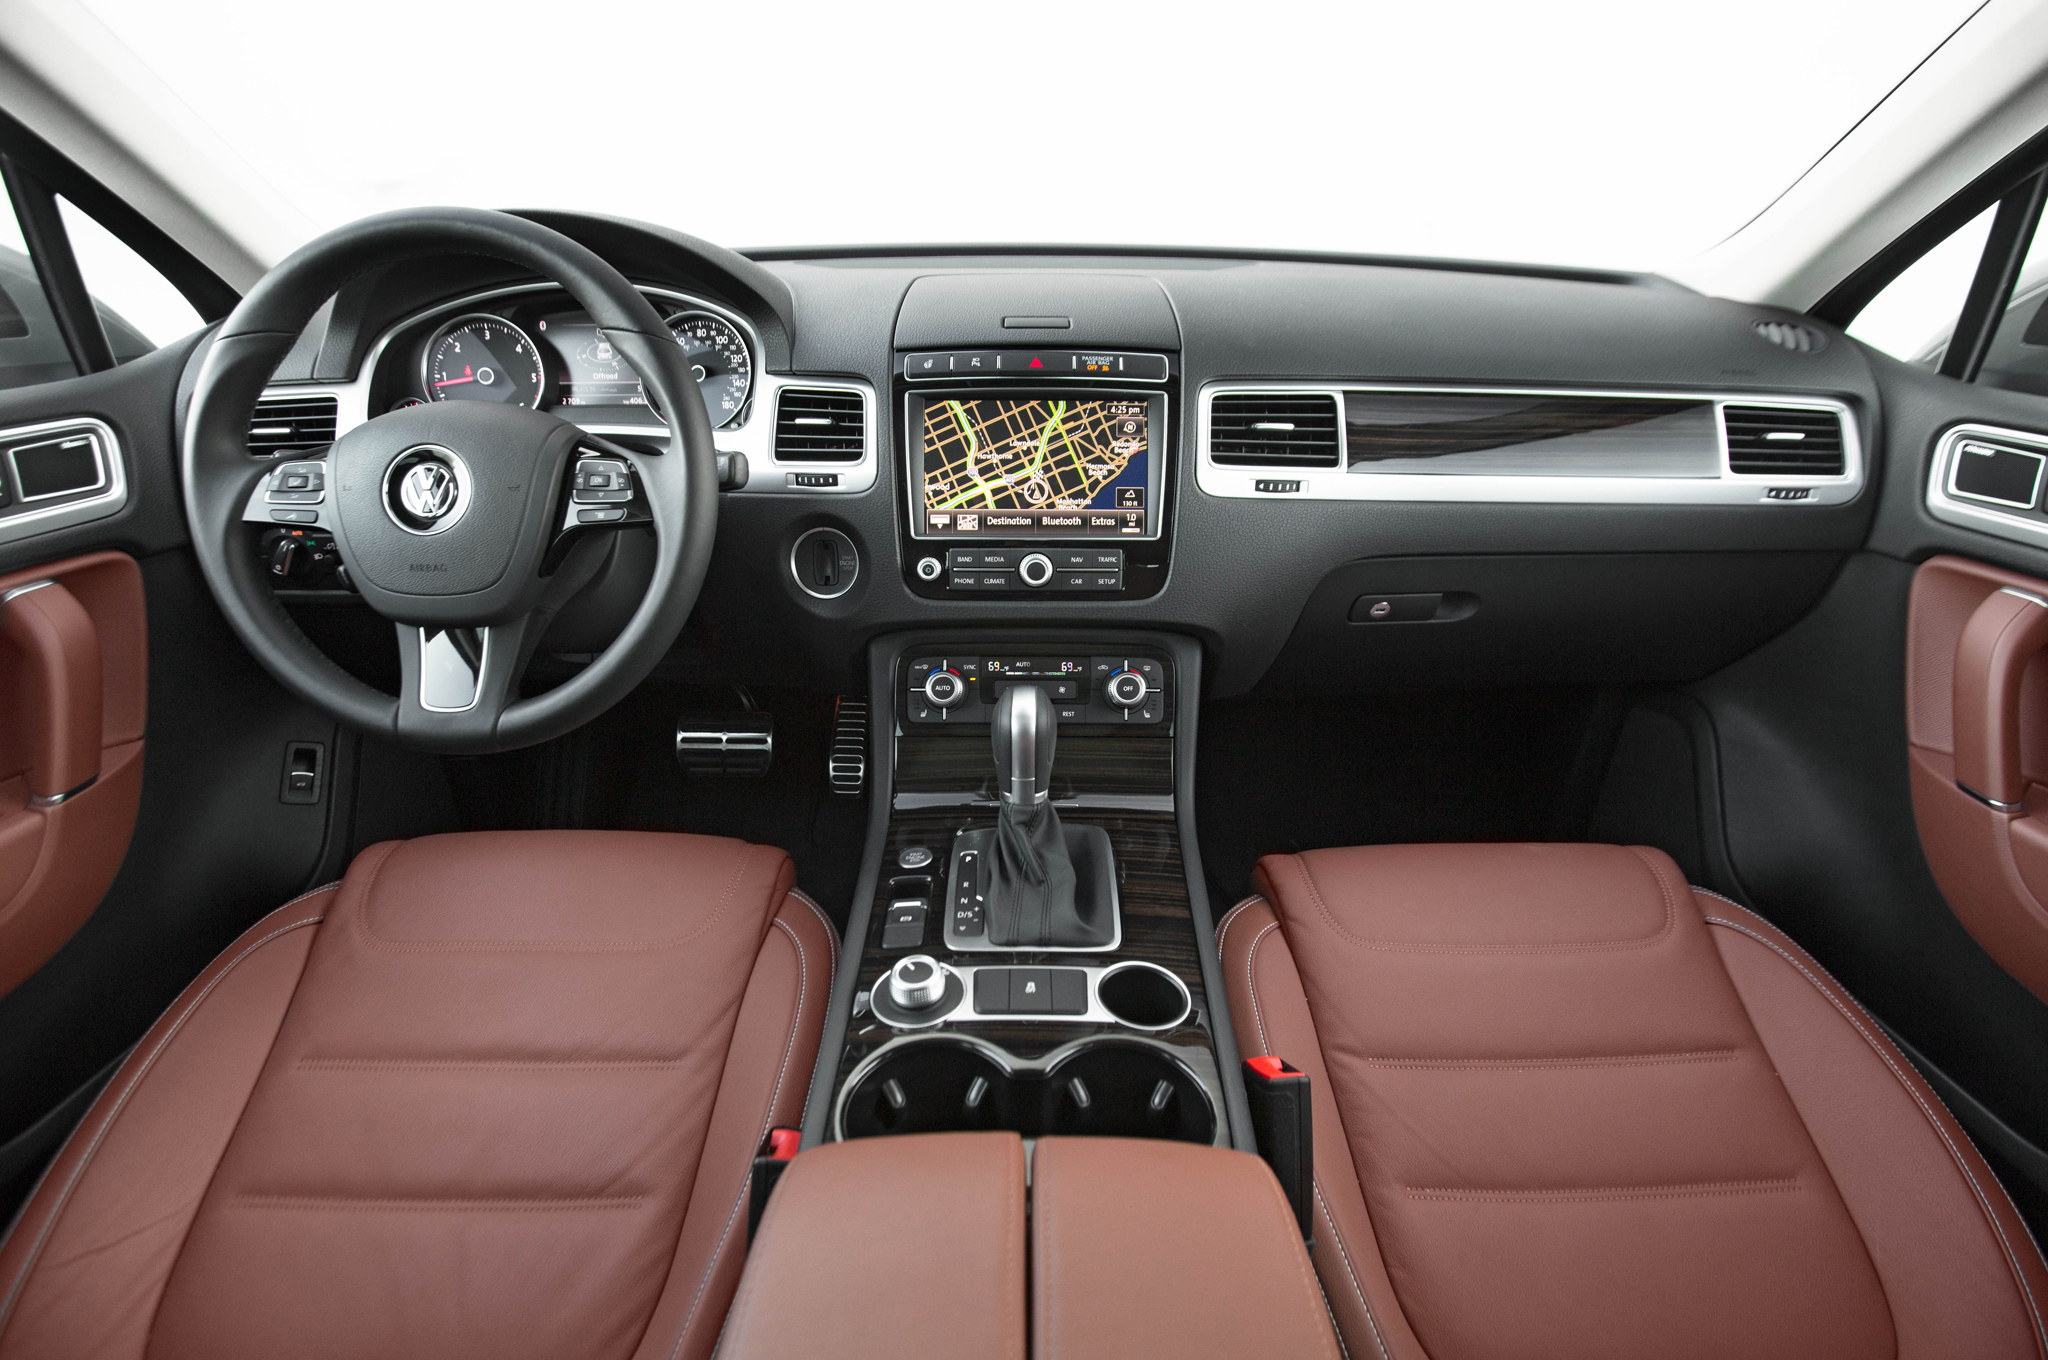 2015-Volkswagen-Touareg-TDI-inteiror